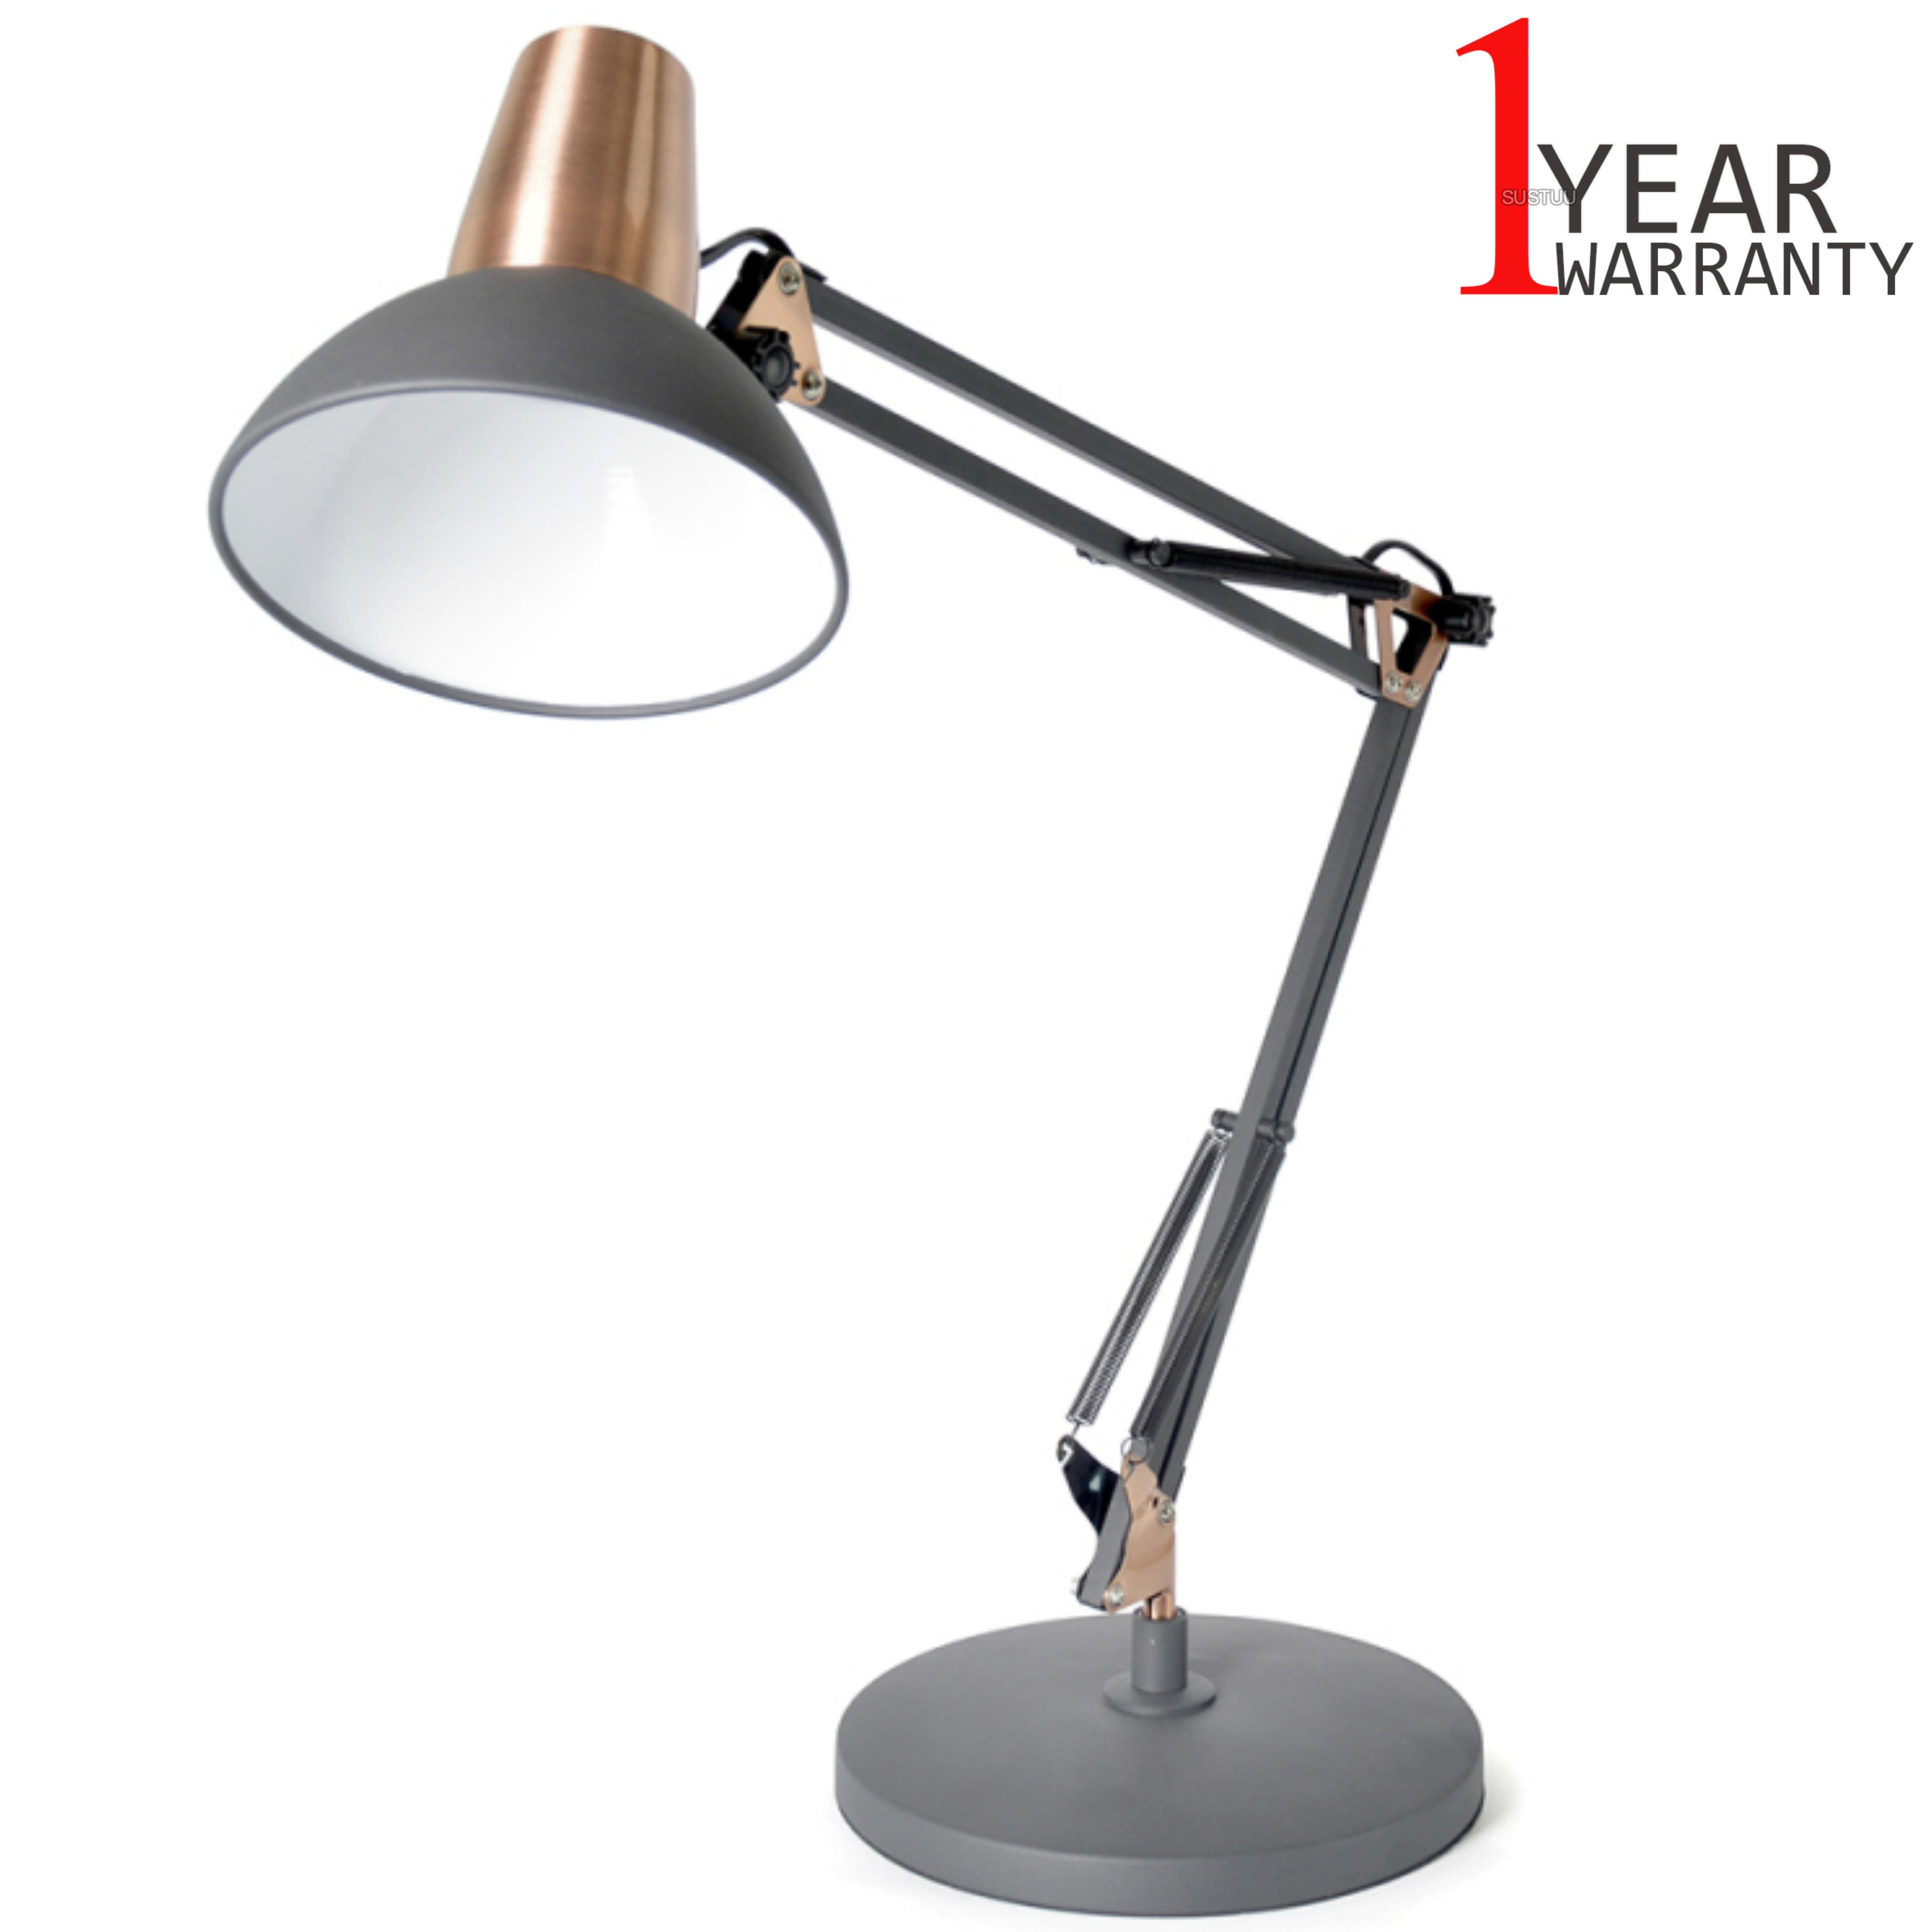 Lloytron 35w Architect Large Desk Lamp | In Line On/Off Switch | Black/Coper | L1124BC